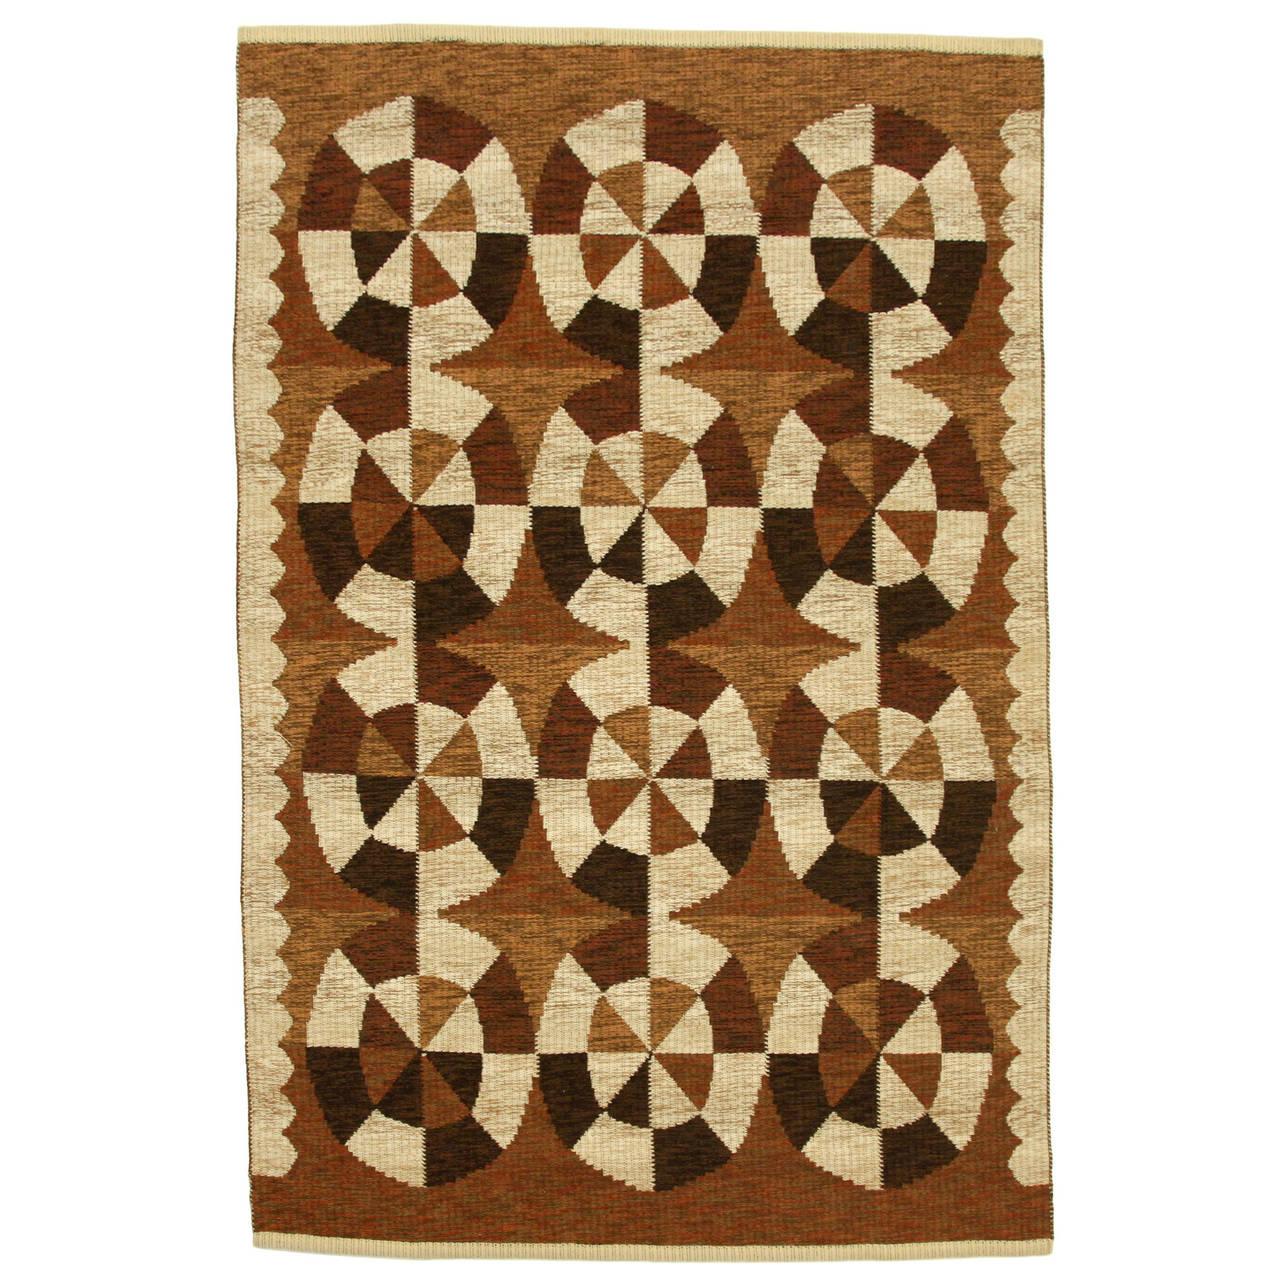 Geometric Mid Century Swedish Flat-Weave Rug At 1stdibs